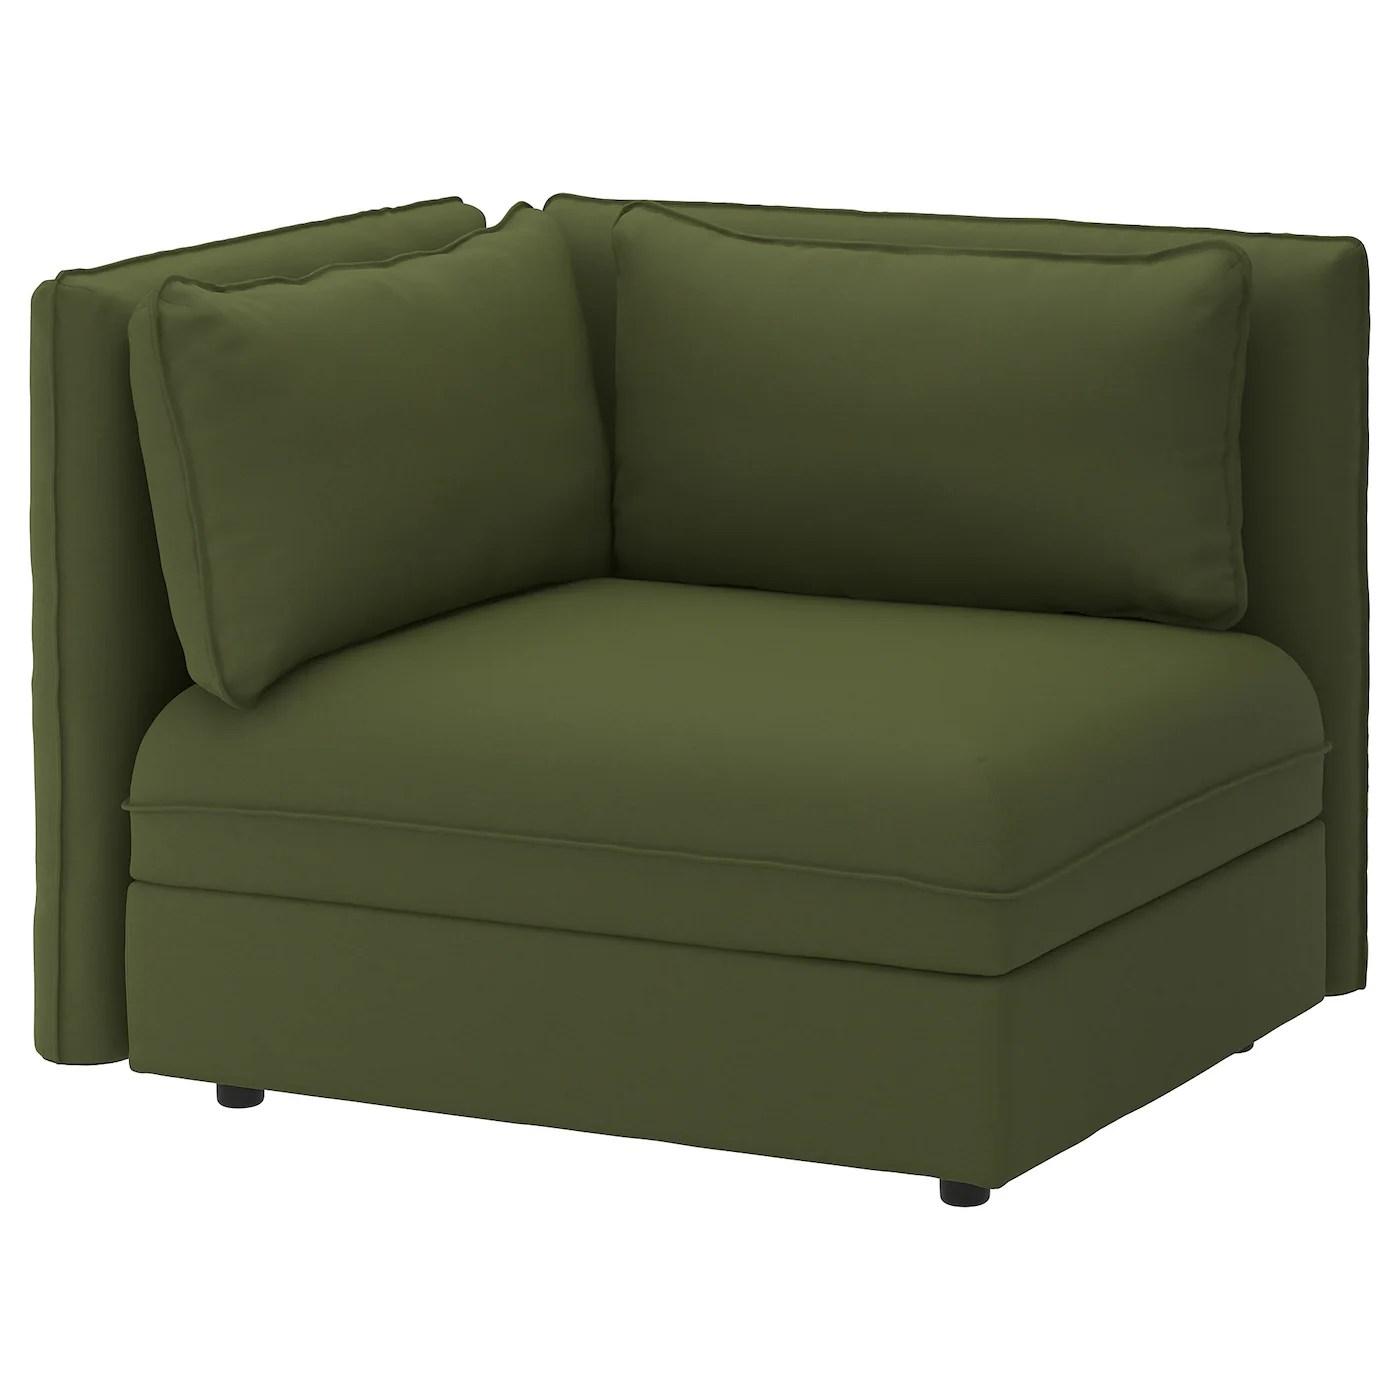 modular sofas ireland sofa chairs canada fabric ikea dublin